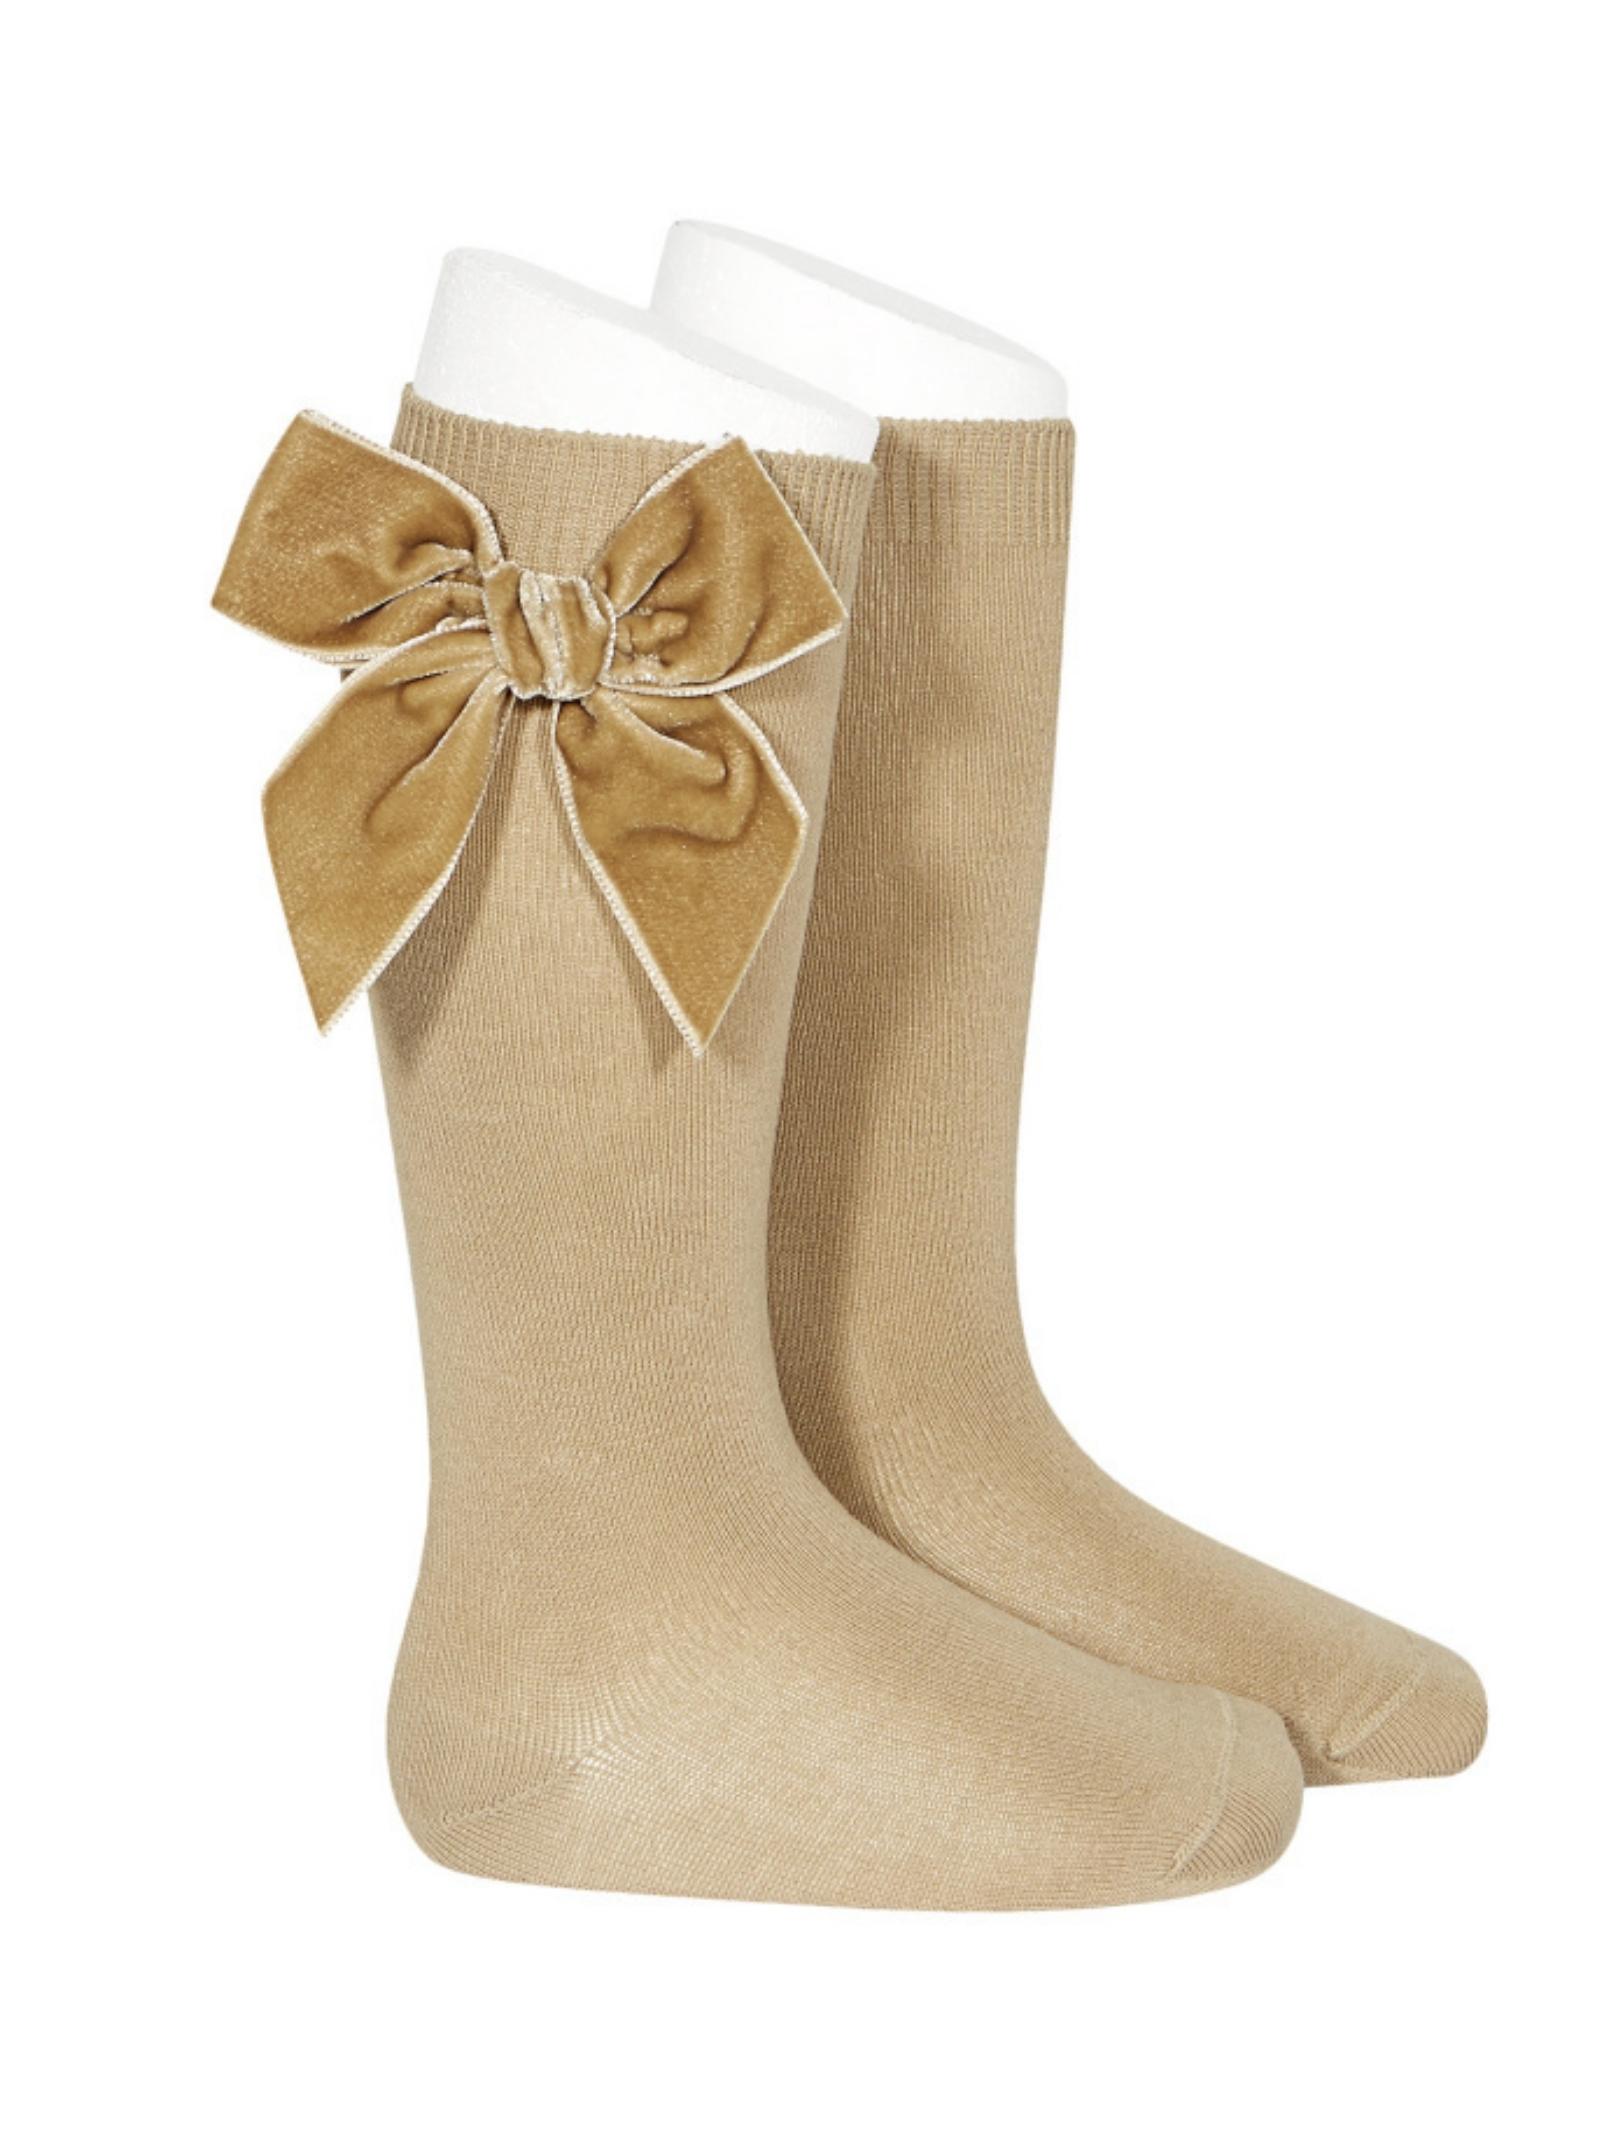 Parisian Bow Socks for Girls CONDOR | Socks | 24892331